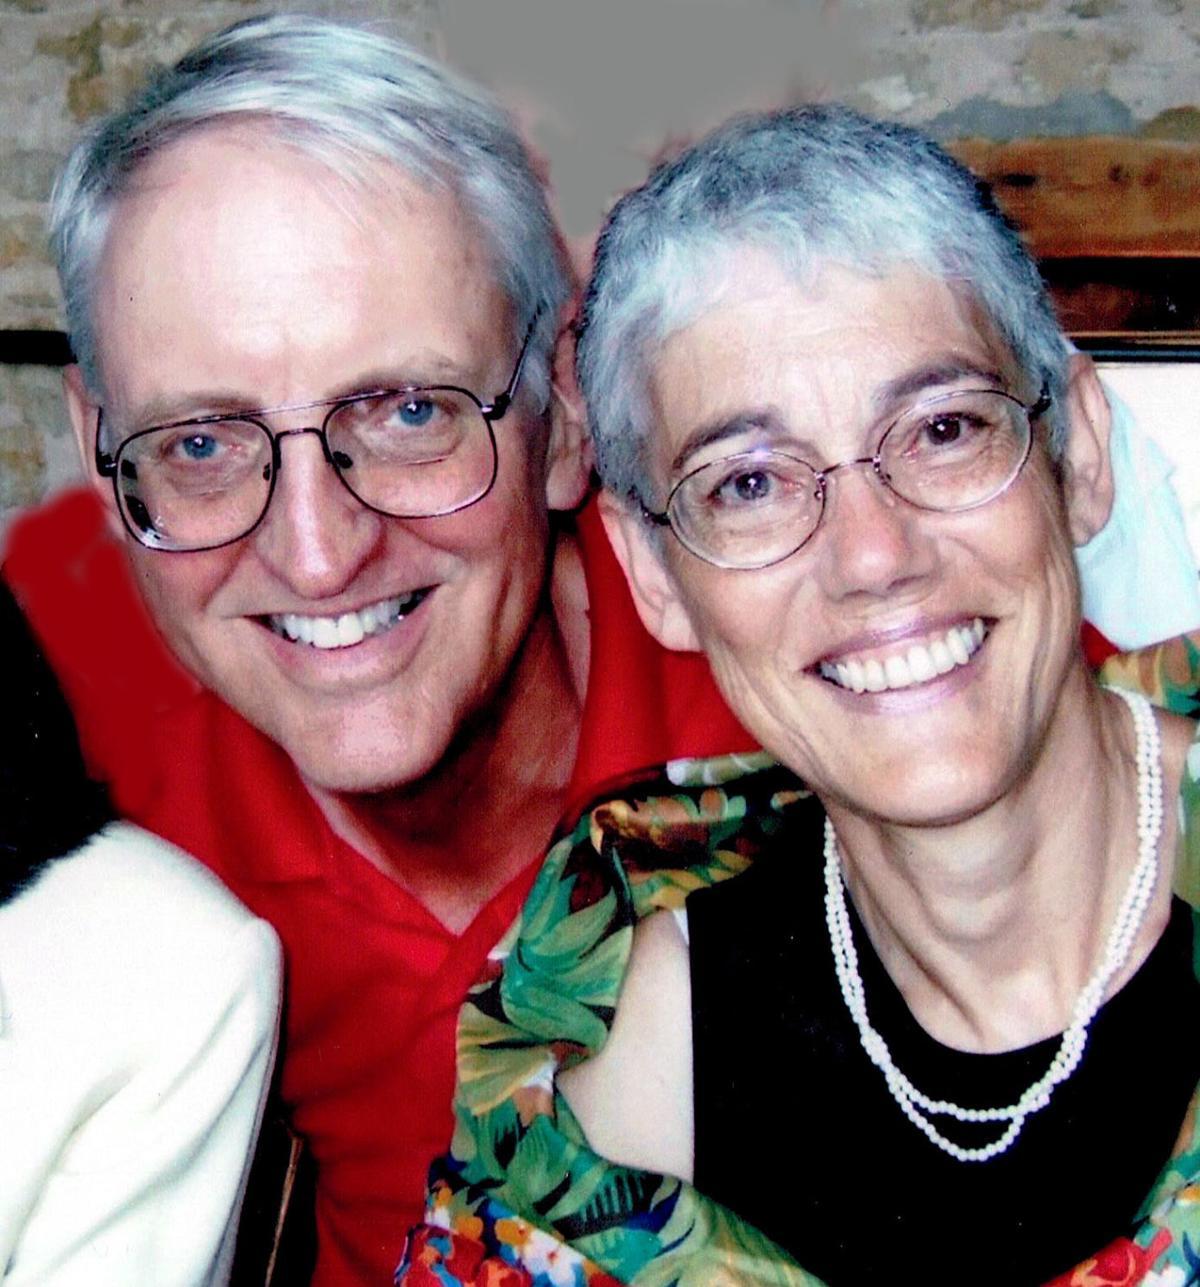 Jeff and Jill Dean